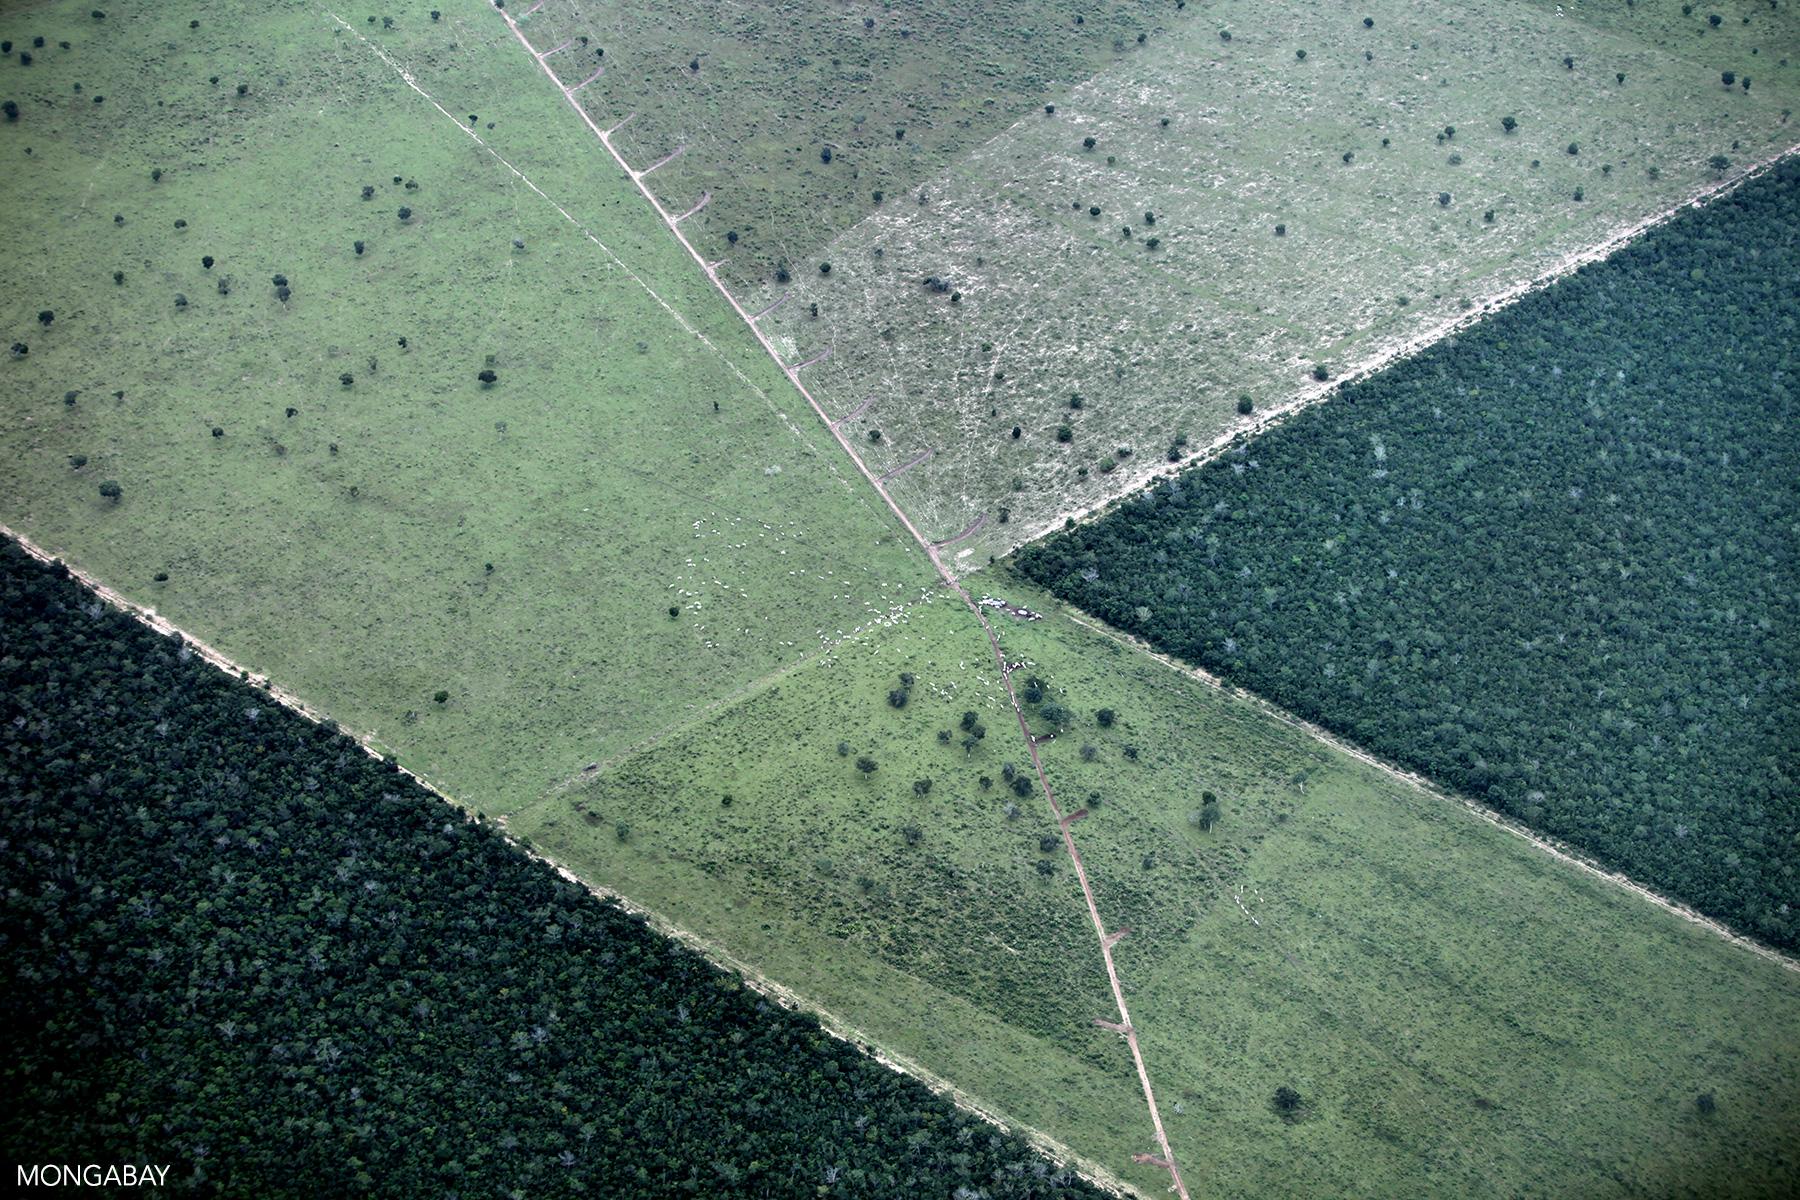 Deforestation for cattle ranching in the Brazilian Amazon. Photo by Rhett A. Butler for Mongabay.